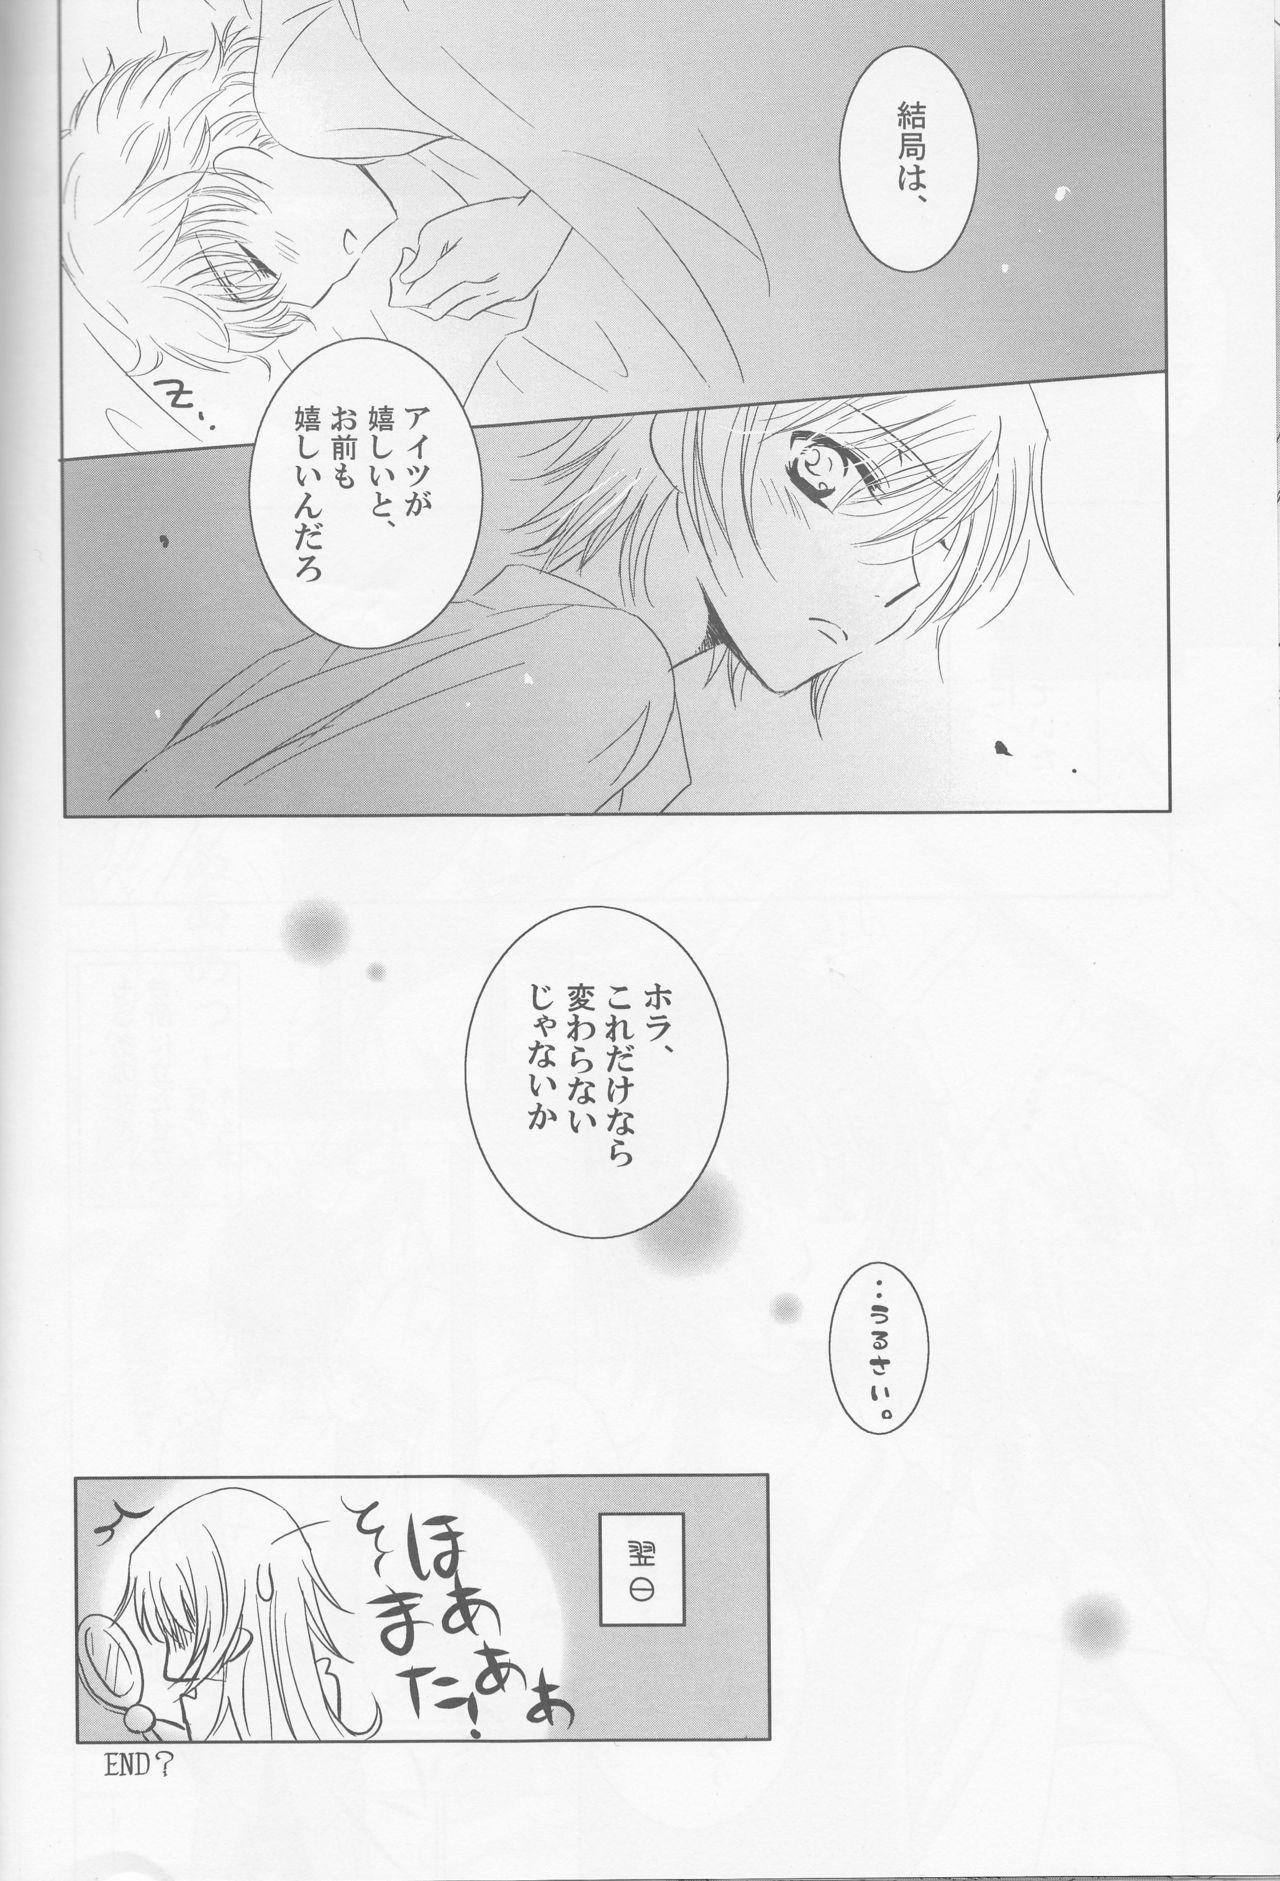 Mitaiken Ryouiki 21